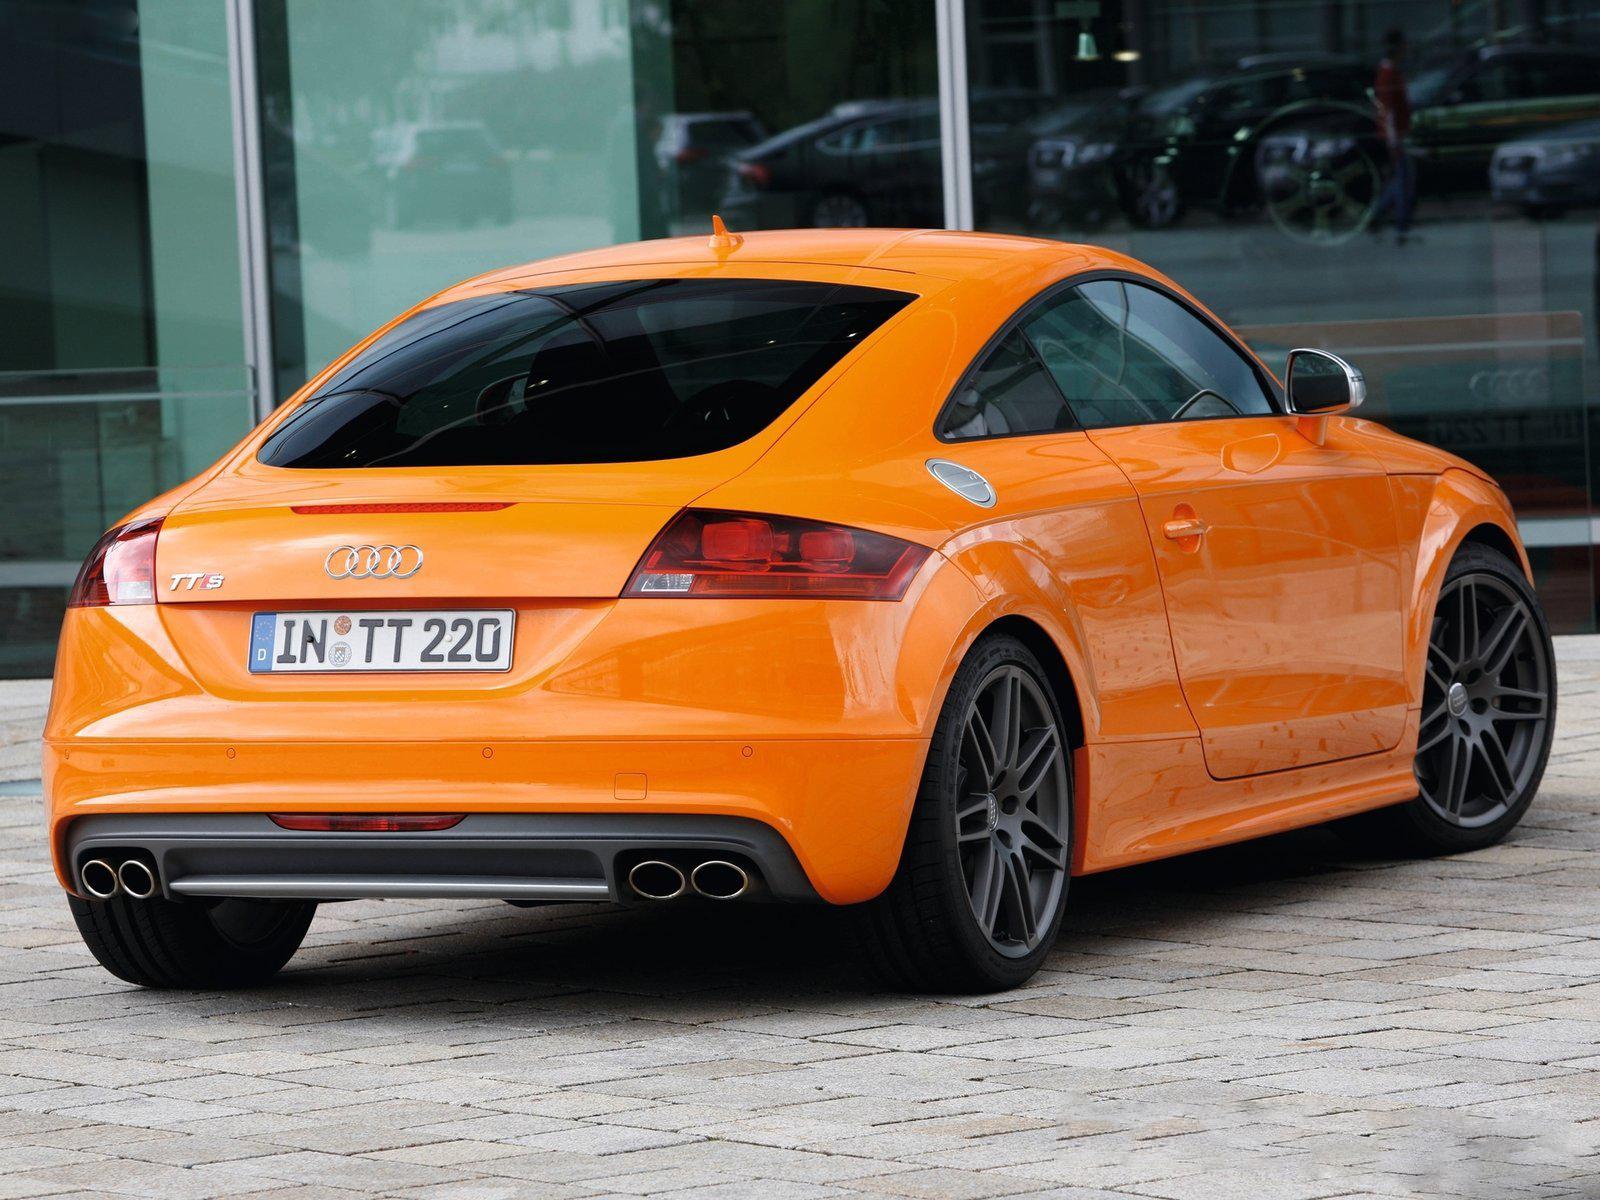 Audi tt coupe owner manual ebook 2011 audi tt coup array automotive database audi tt rh autocarbase com fandeluxe Images